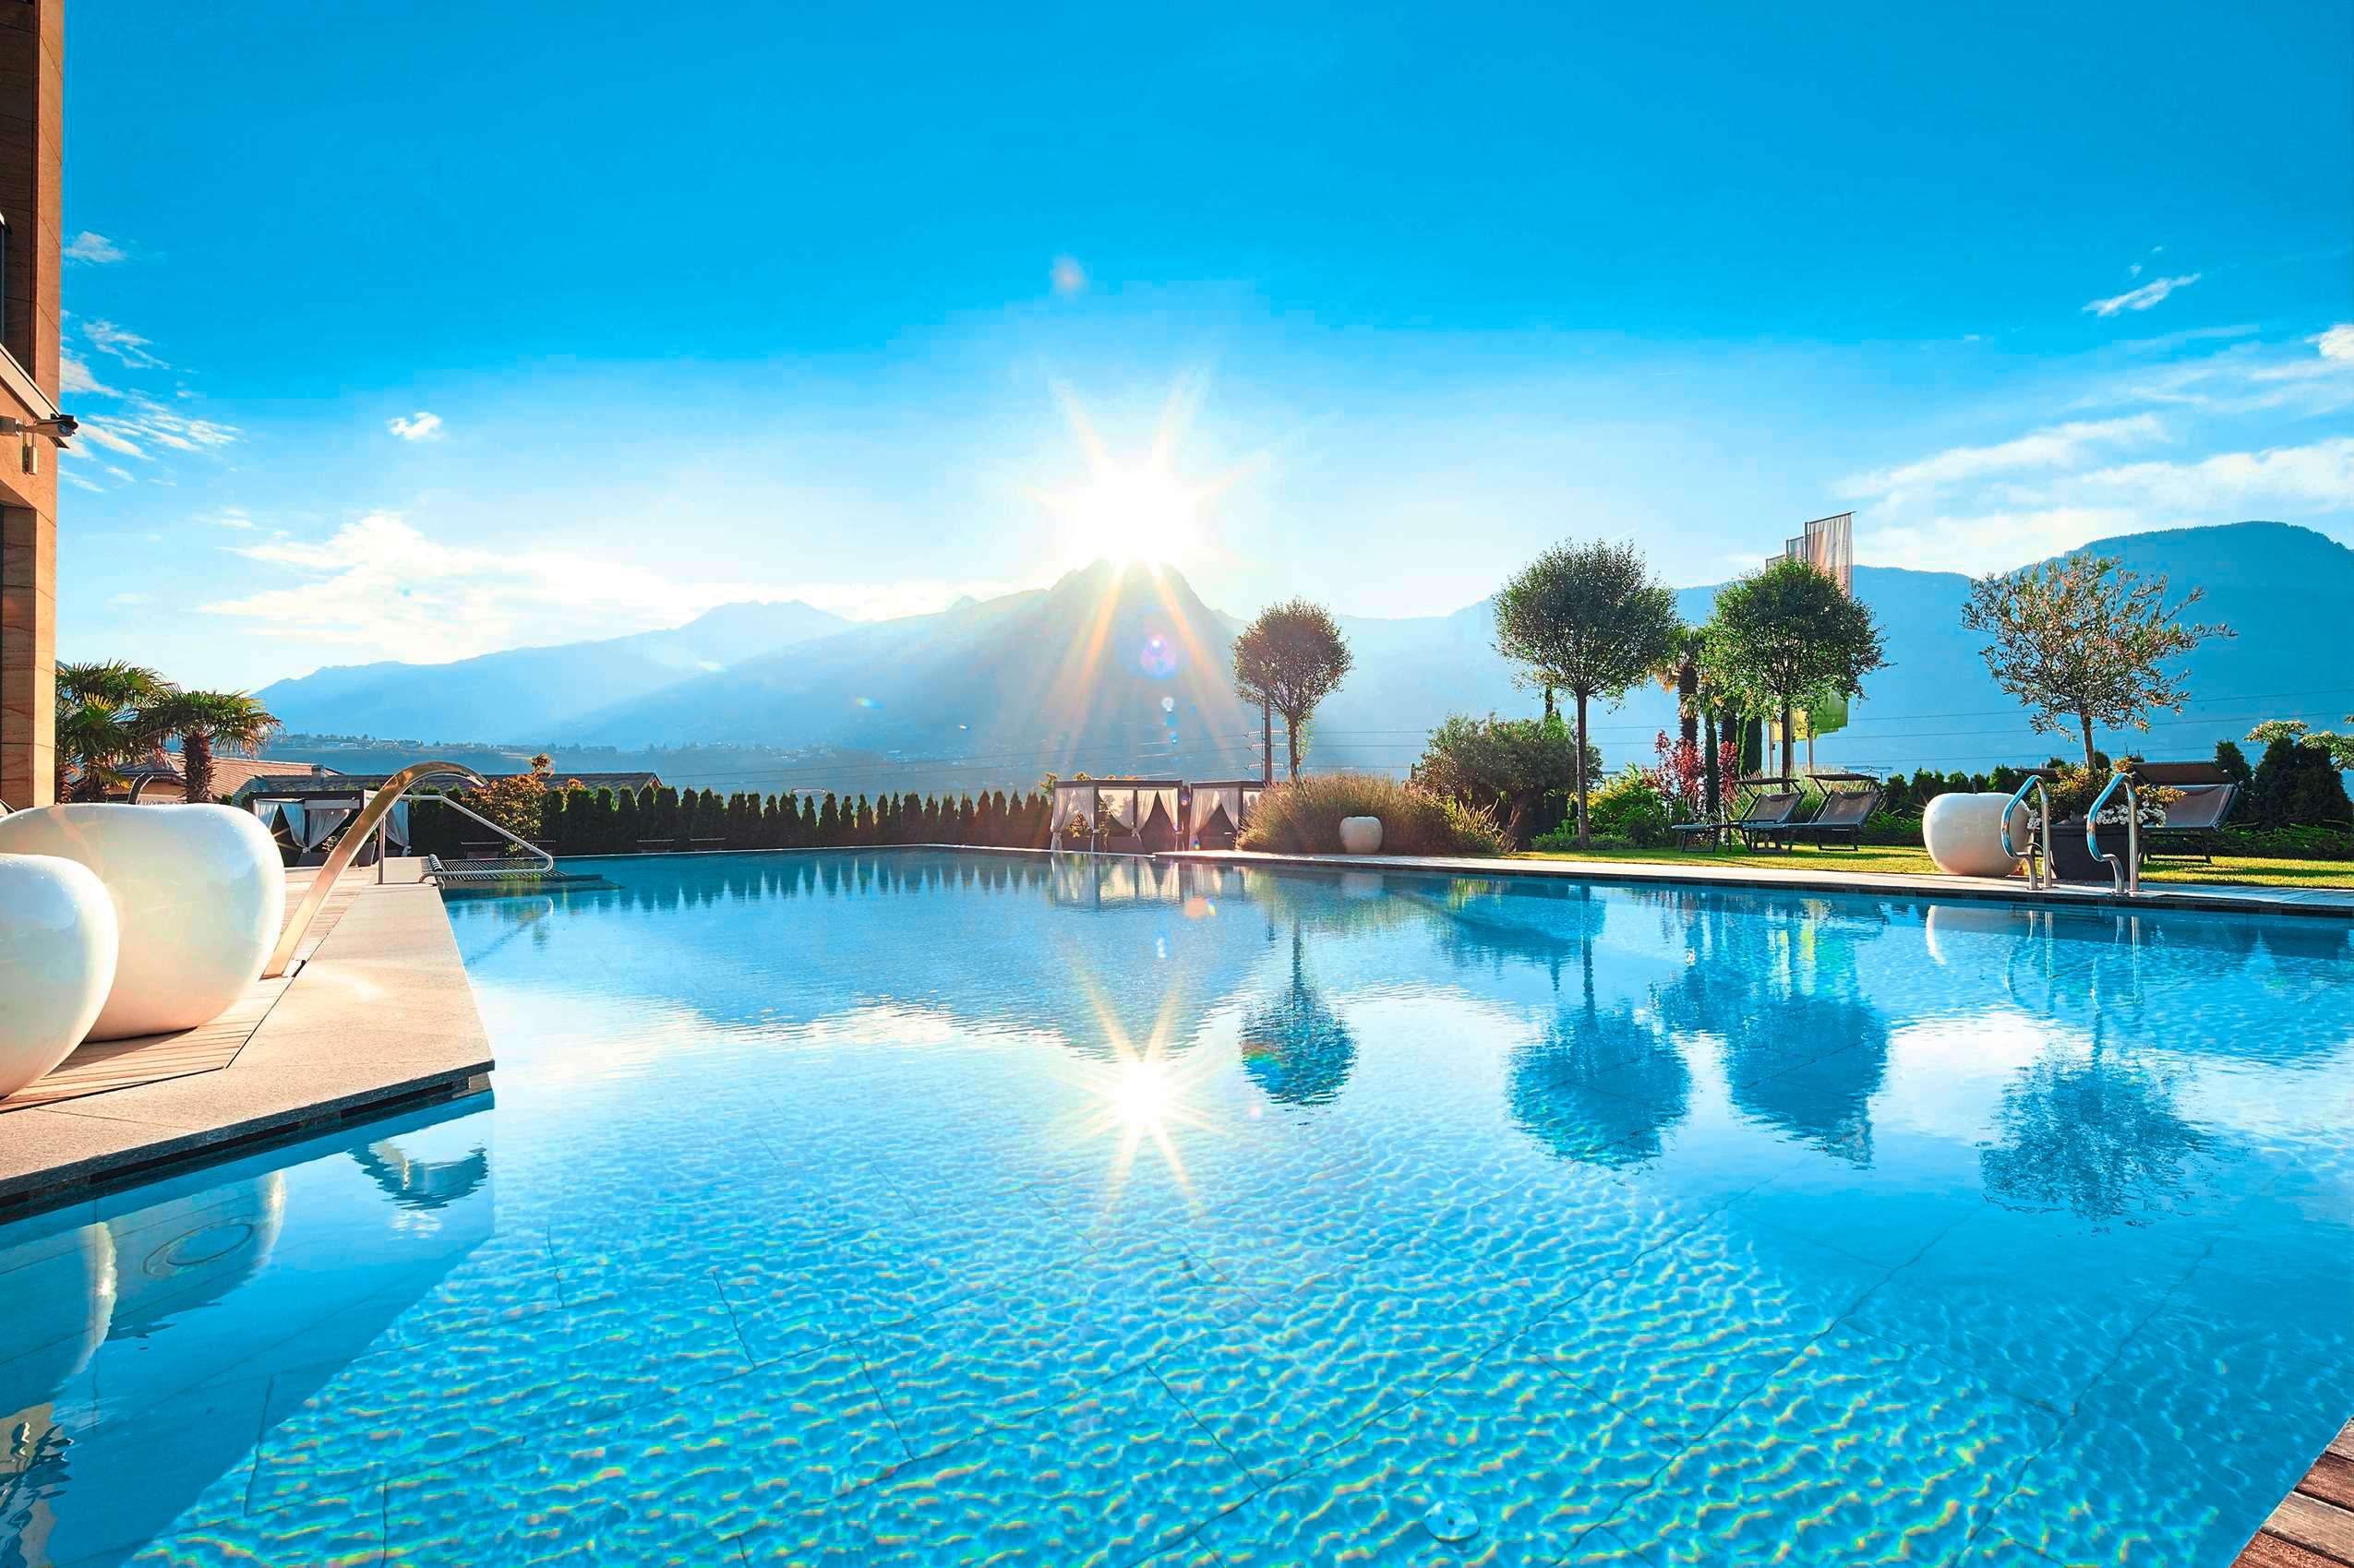 Hotelpool des La Maiena Meran Resort im Sommer